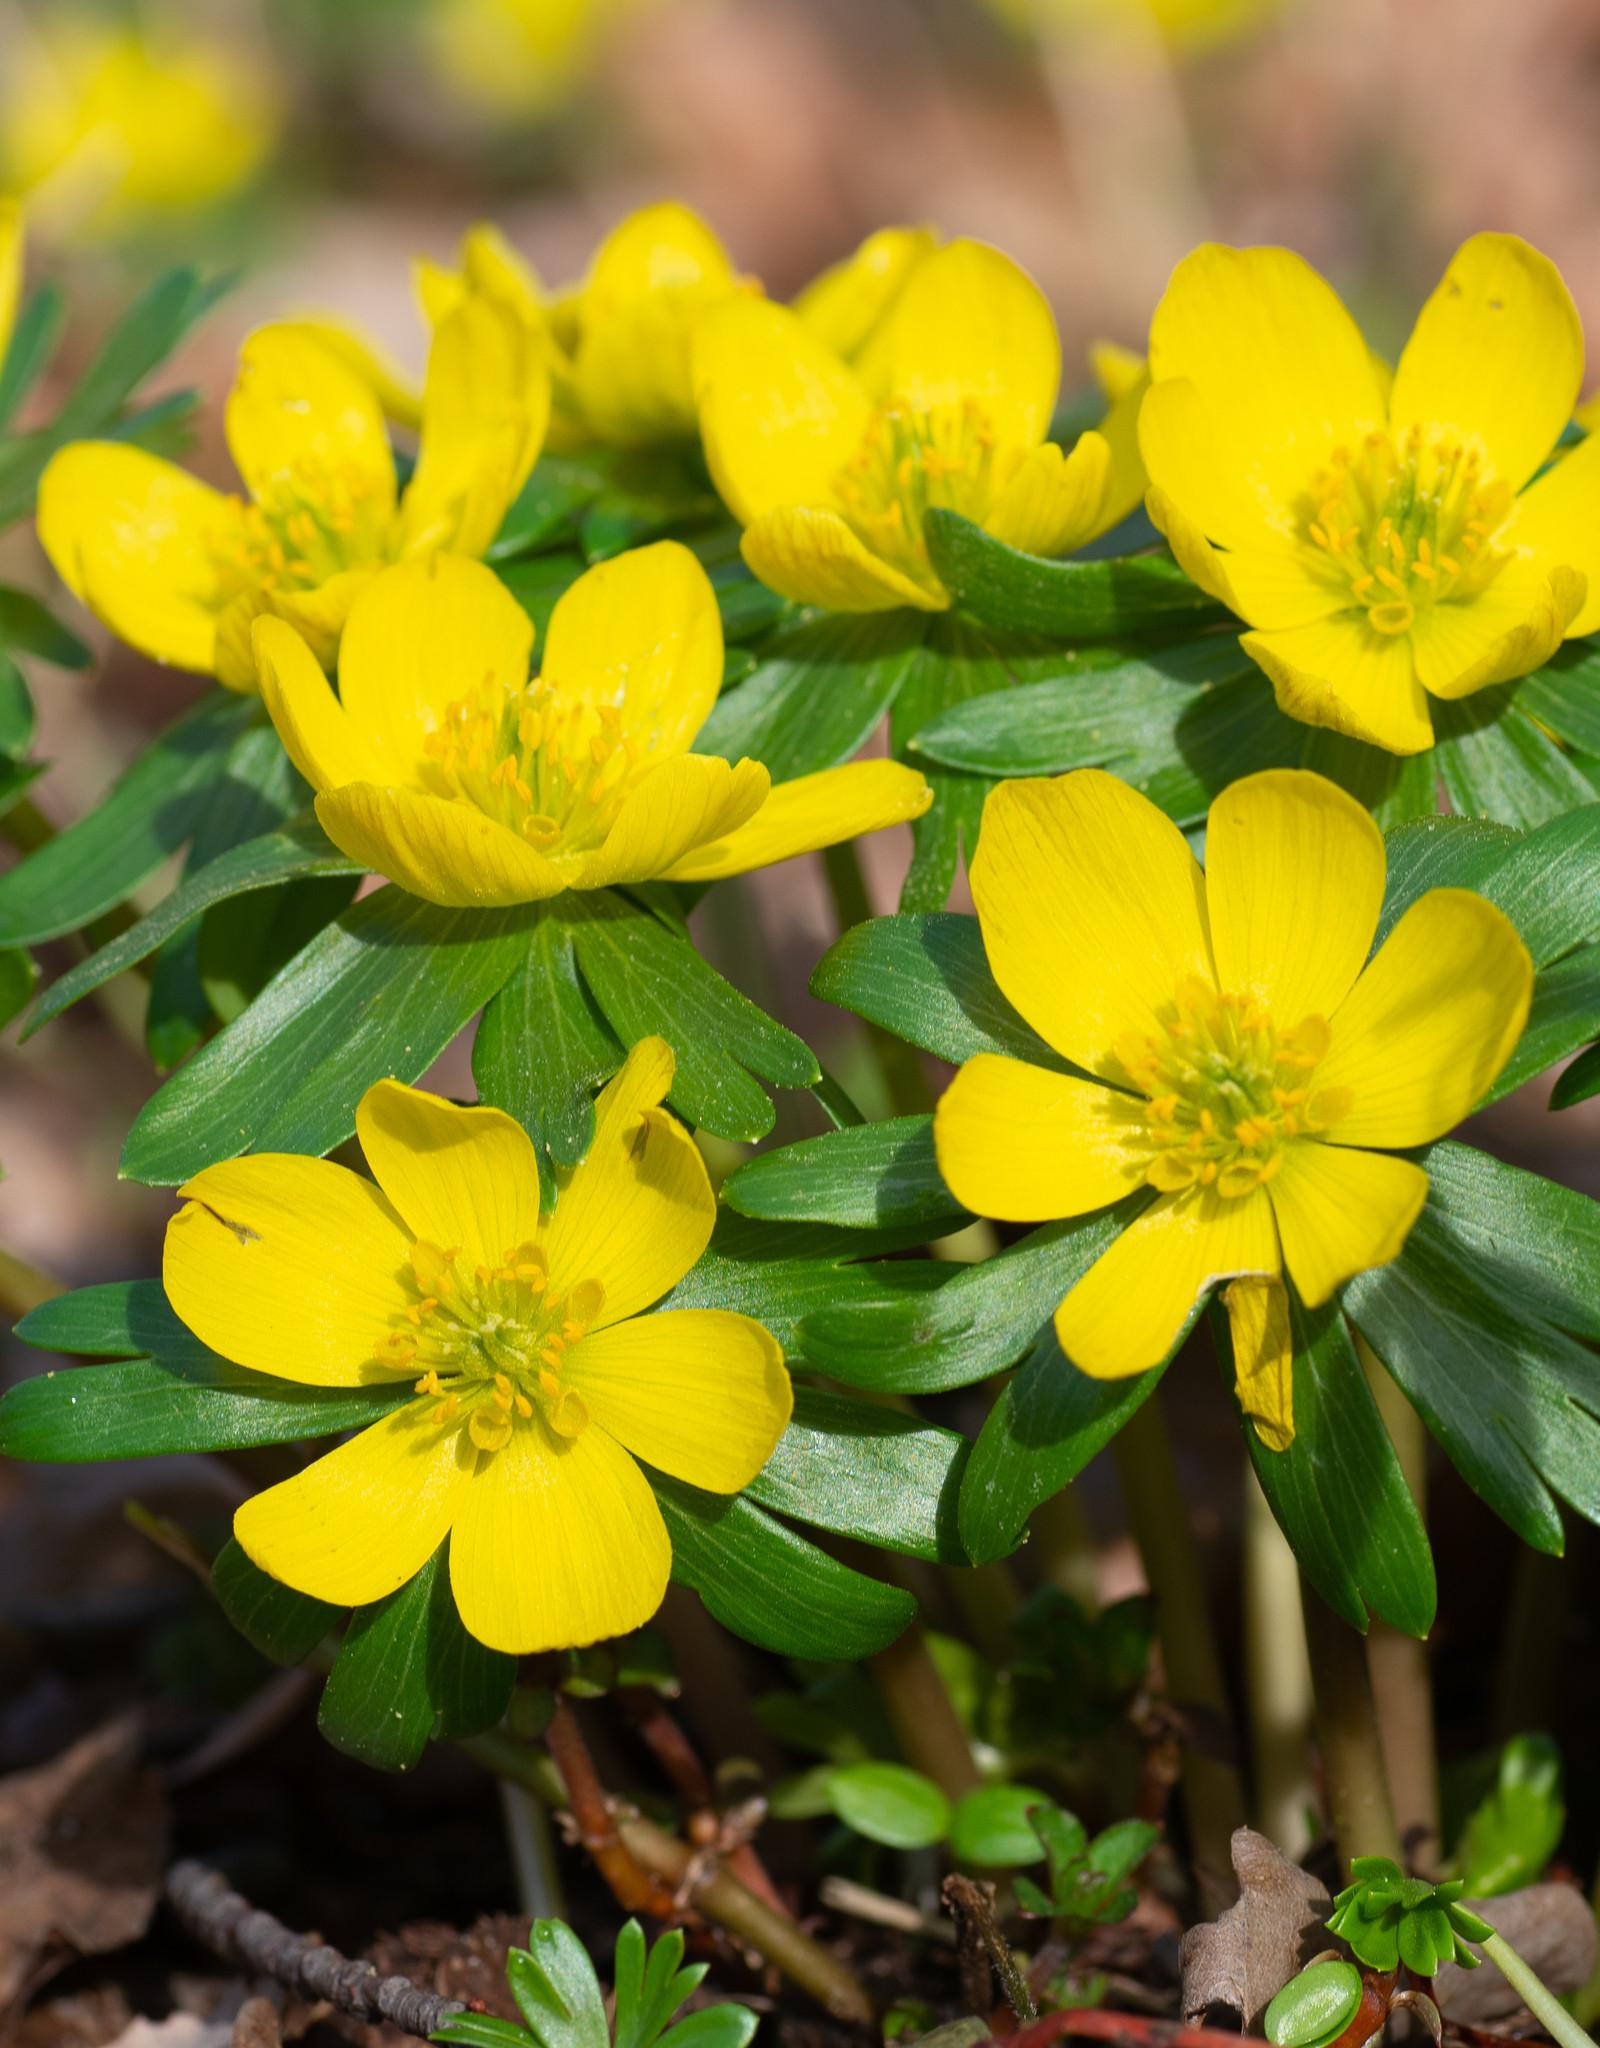 Winterling  Eranthis hyemalis (Winterling) - Stinsenpflanze